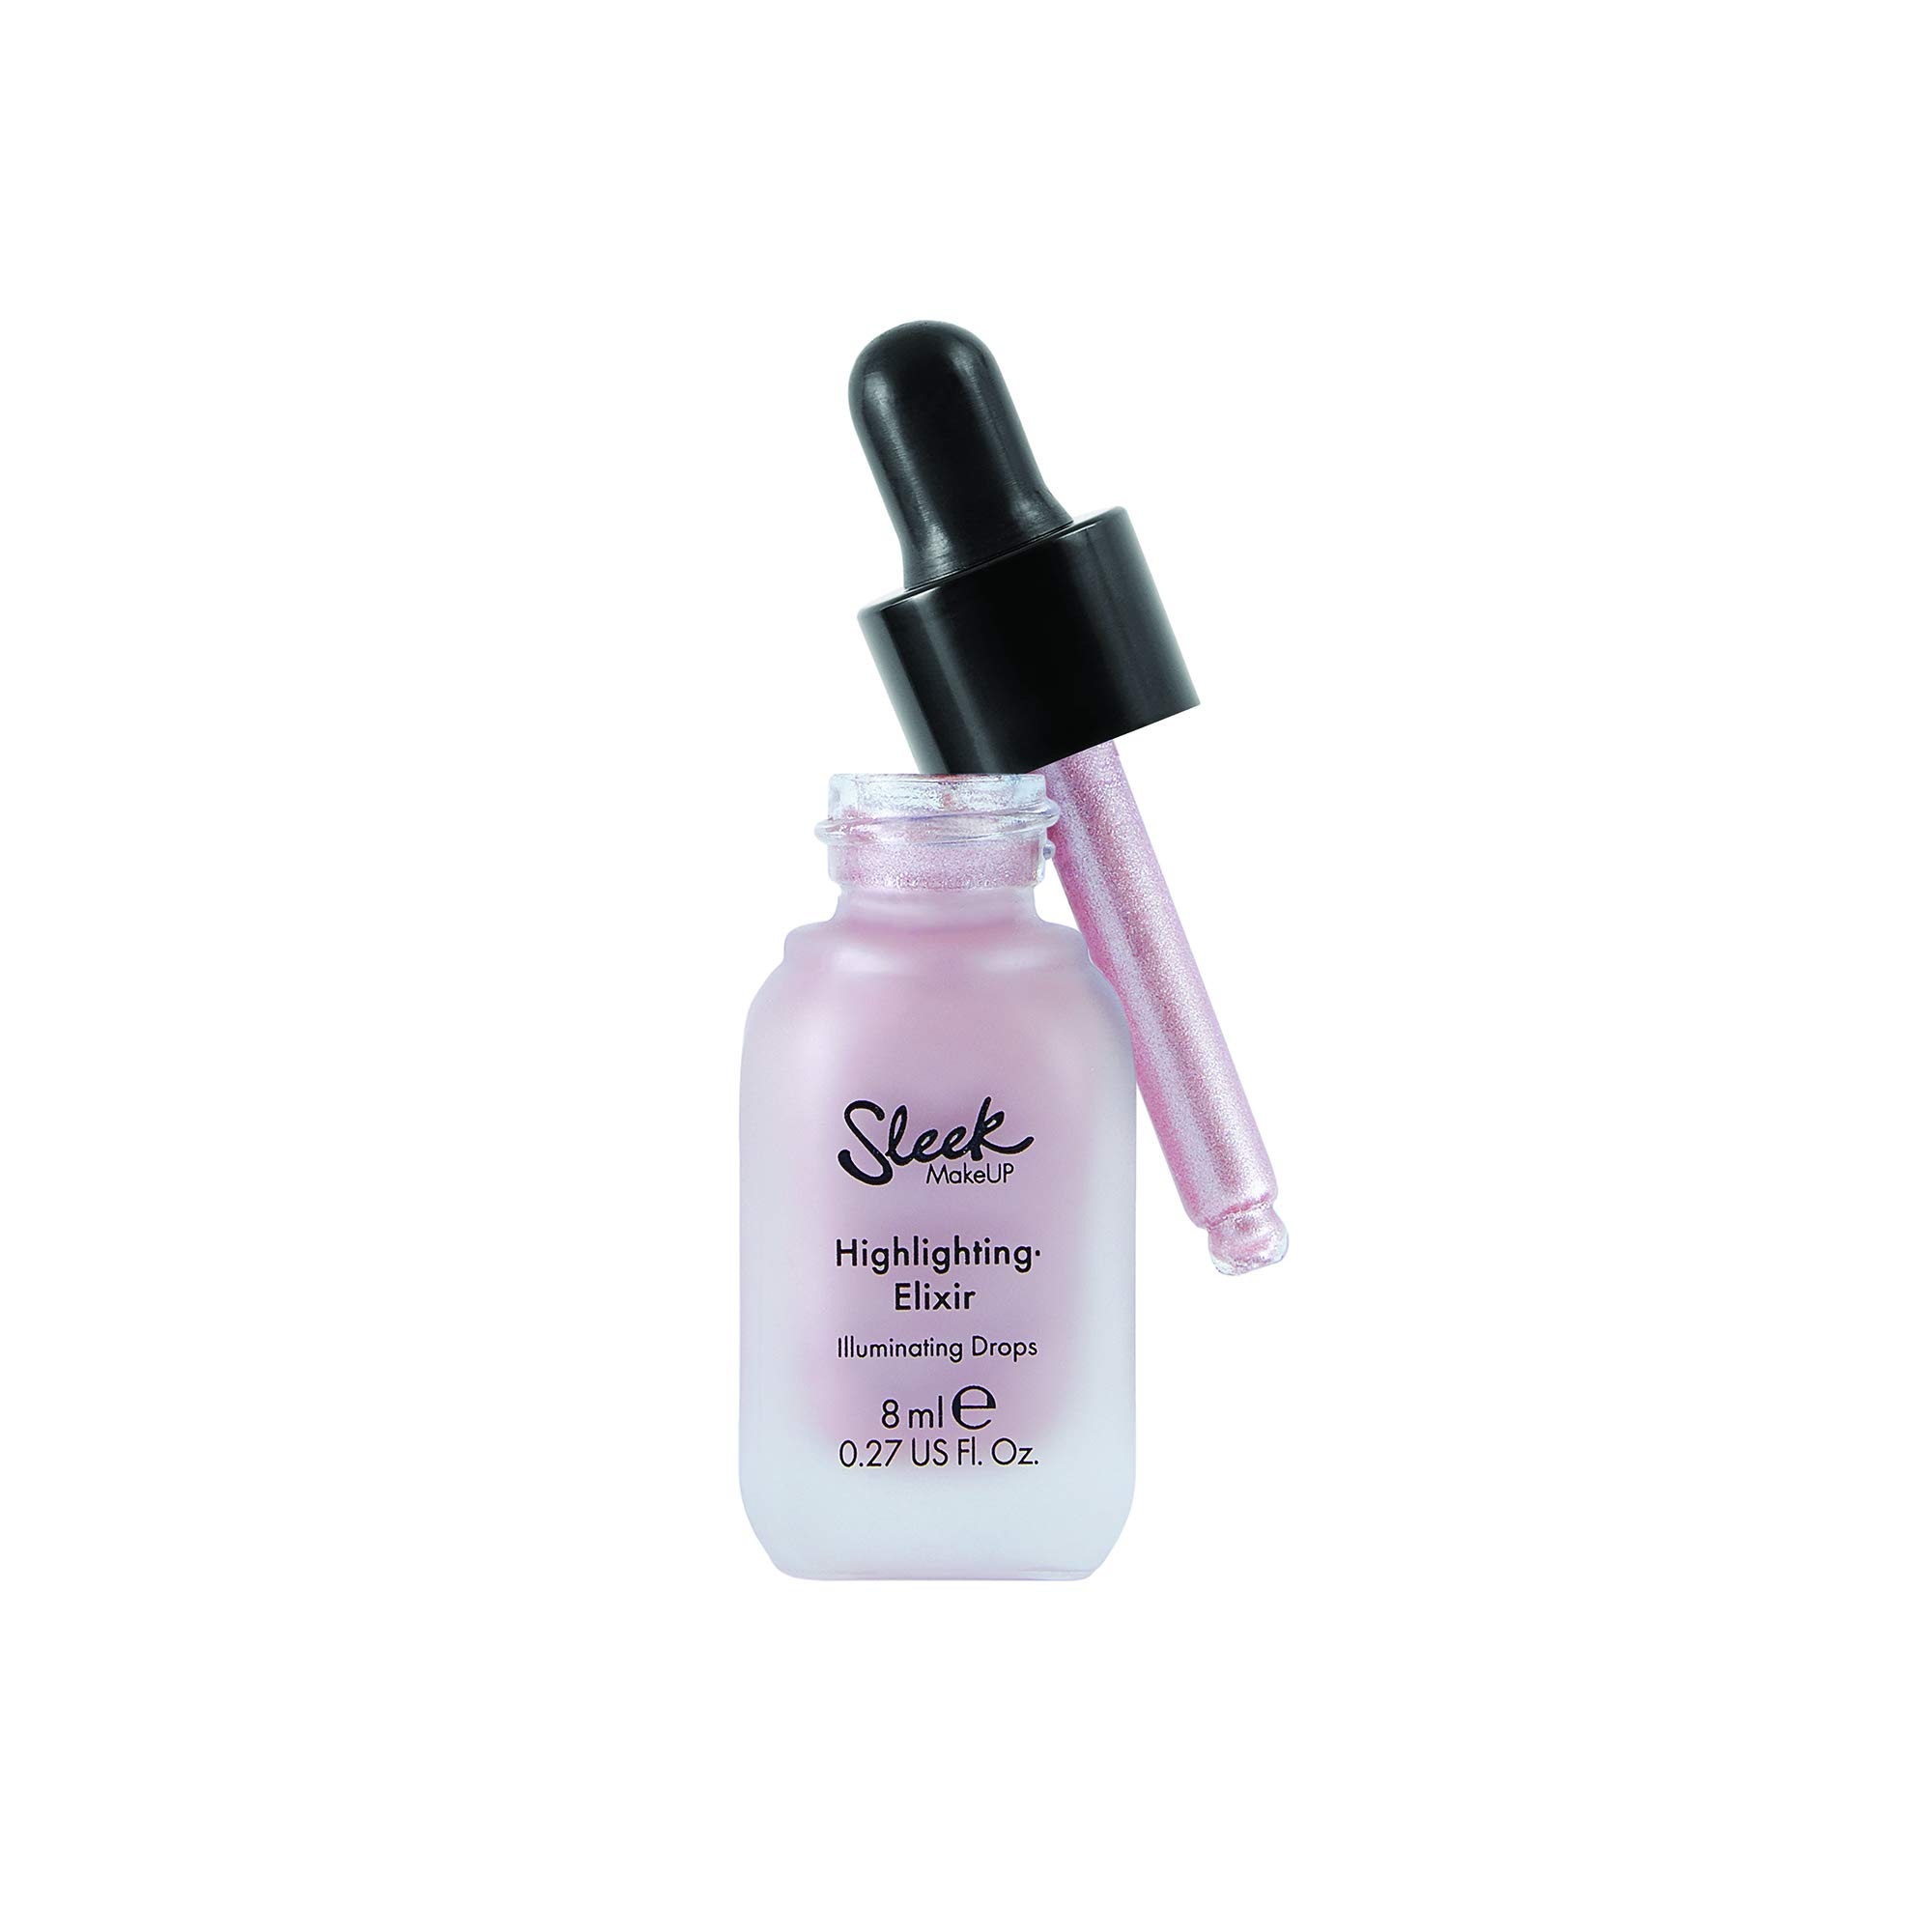 Sleek MakeUP Highlighting Elixir, Radiant Skin, Customisable, Buildable, Easy to Use, Solstice Hemisphere, 40g